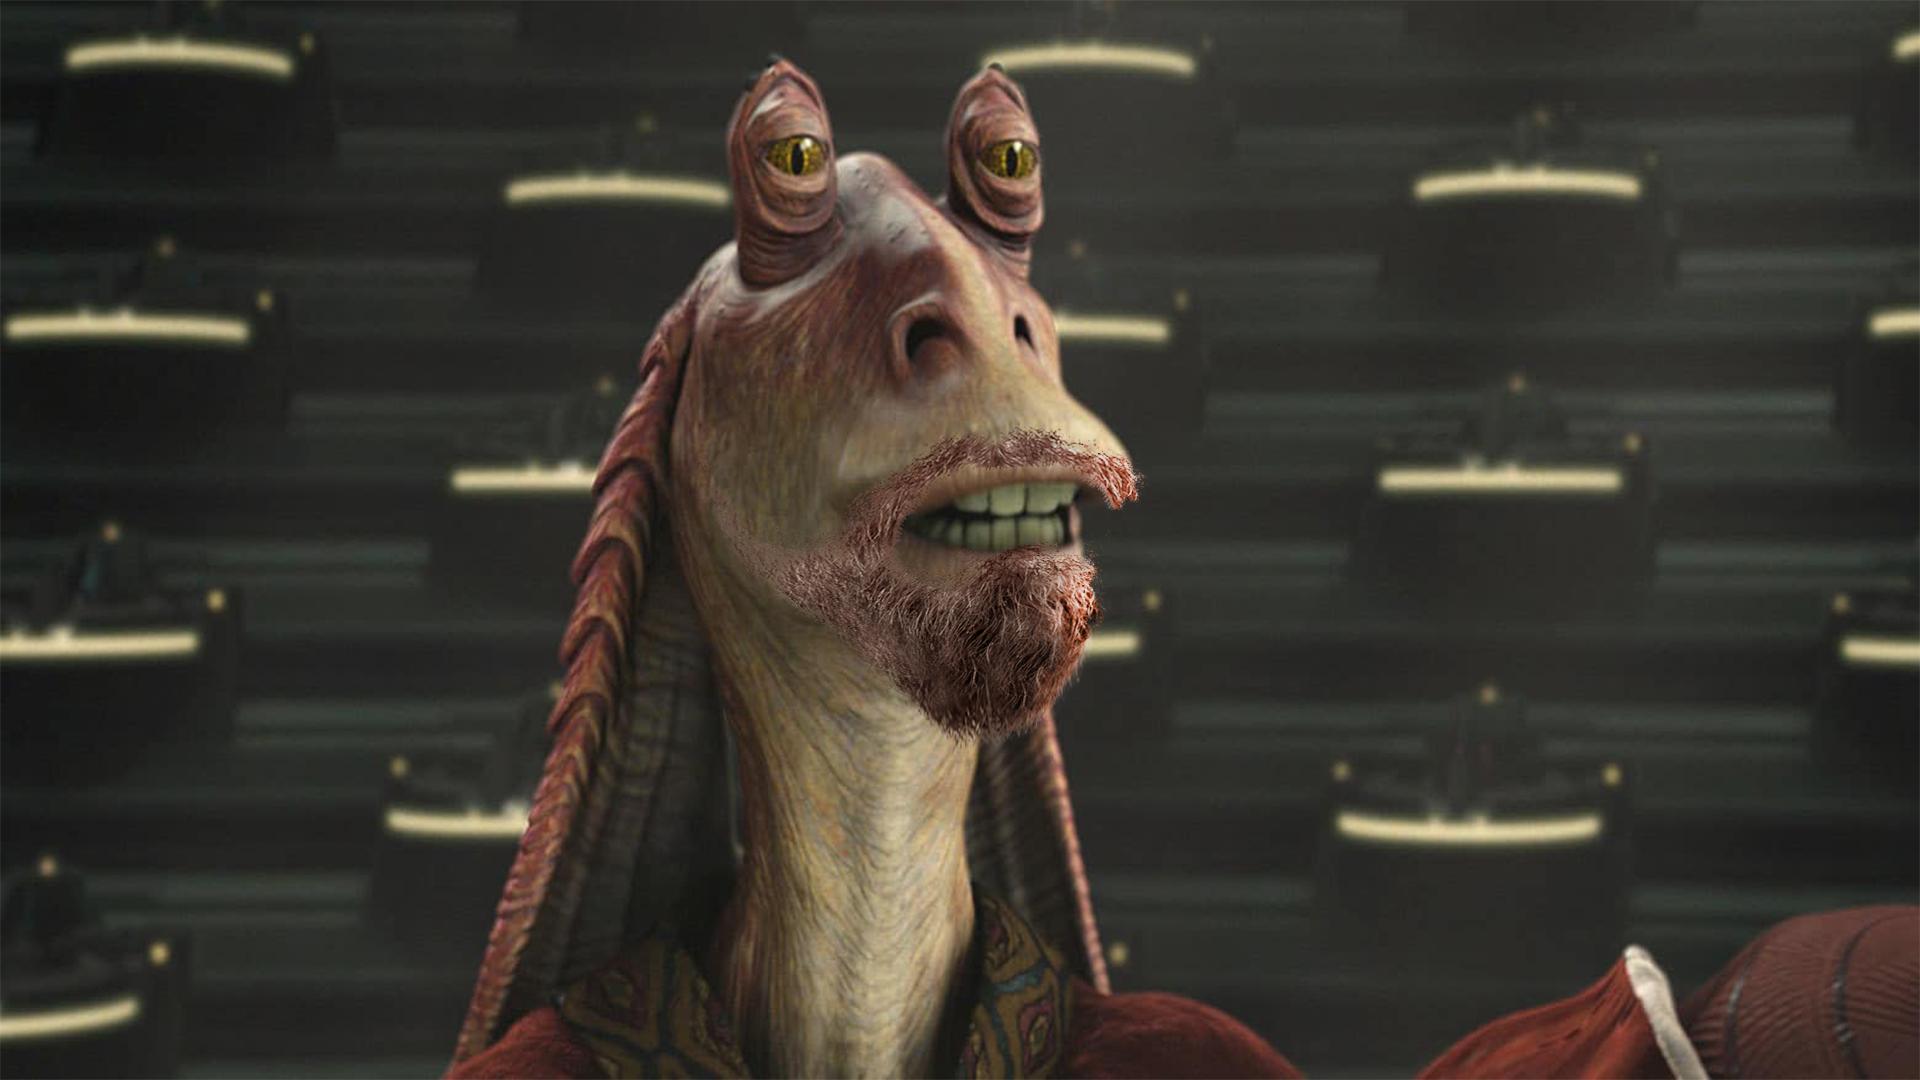 Star Wars Rumour Claims A Bearded Jar Jar Binks Will Appear In The